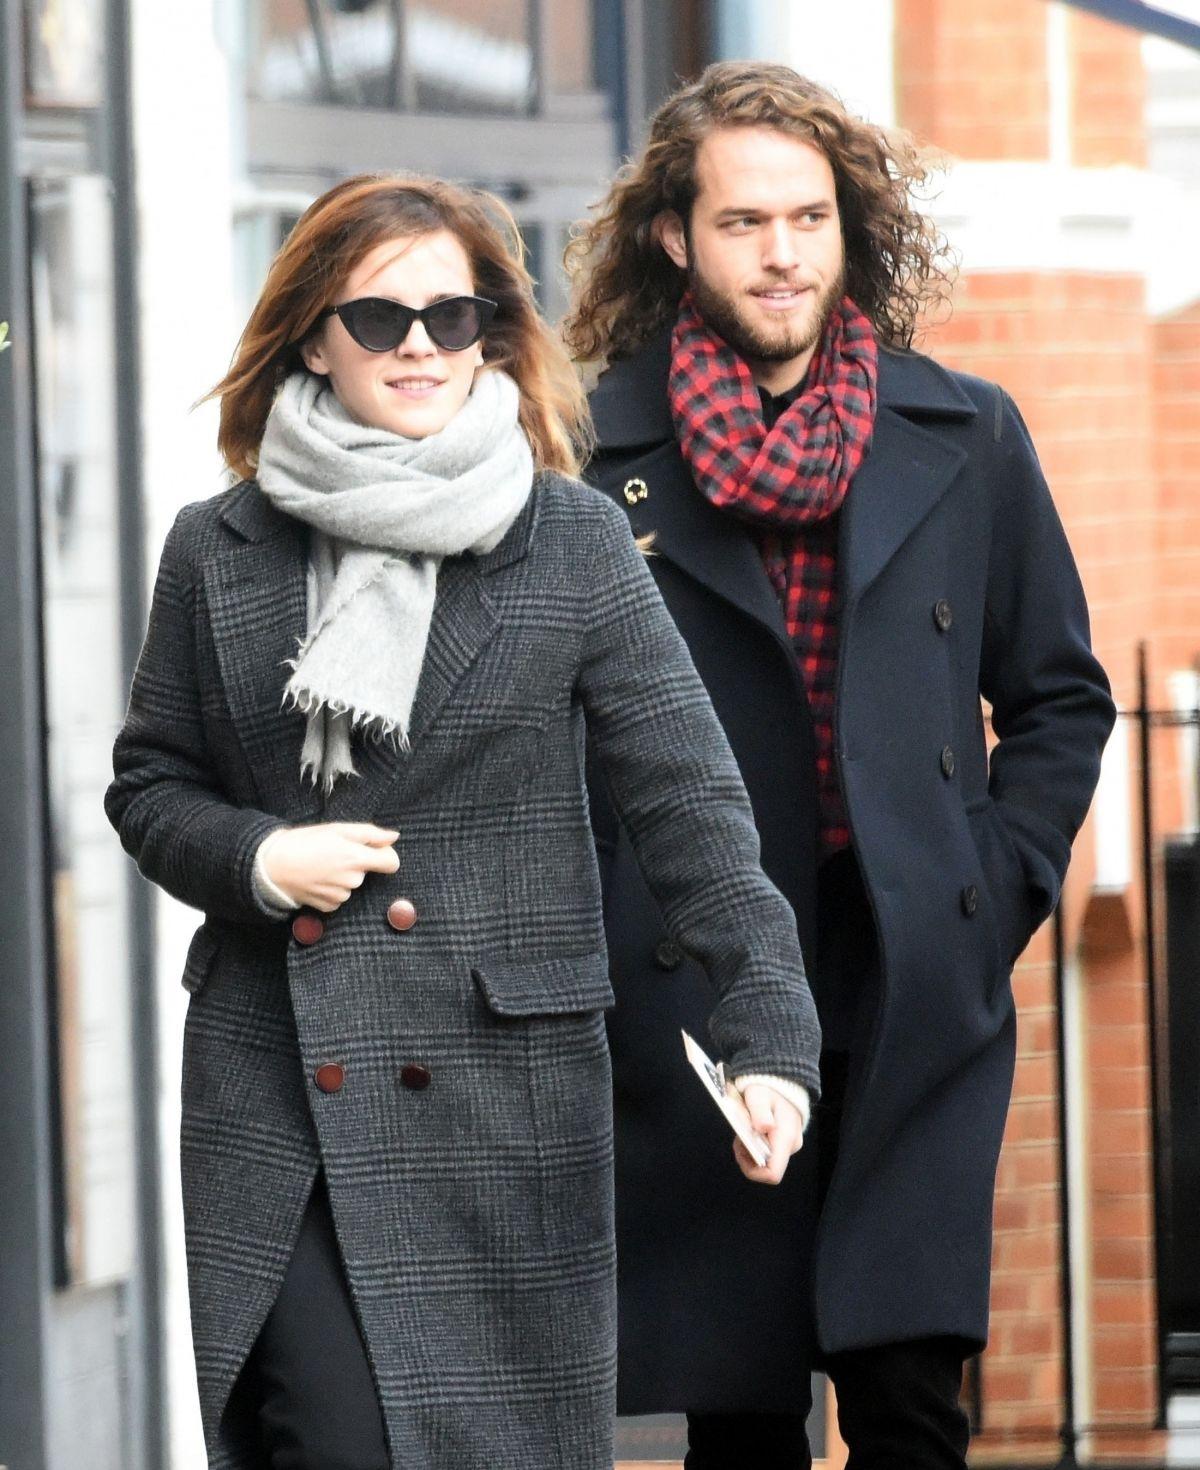 EMMA WATSON Out with Her Boyfriend in London 12/18/2019